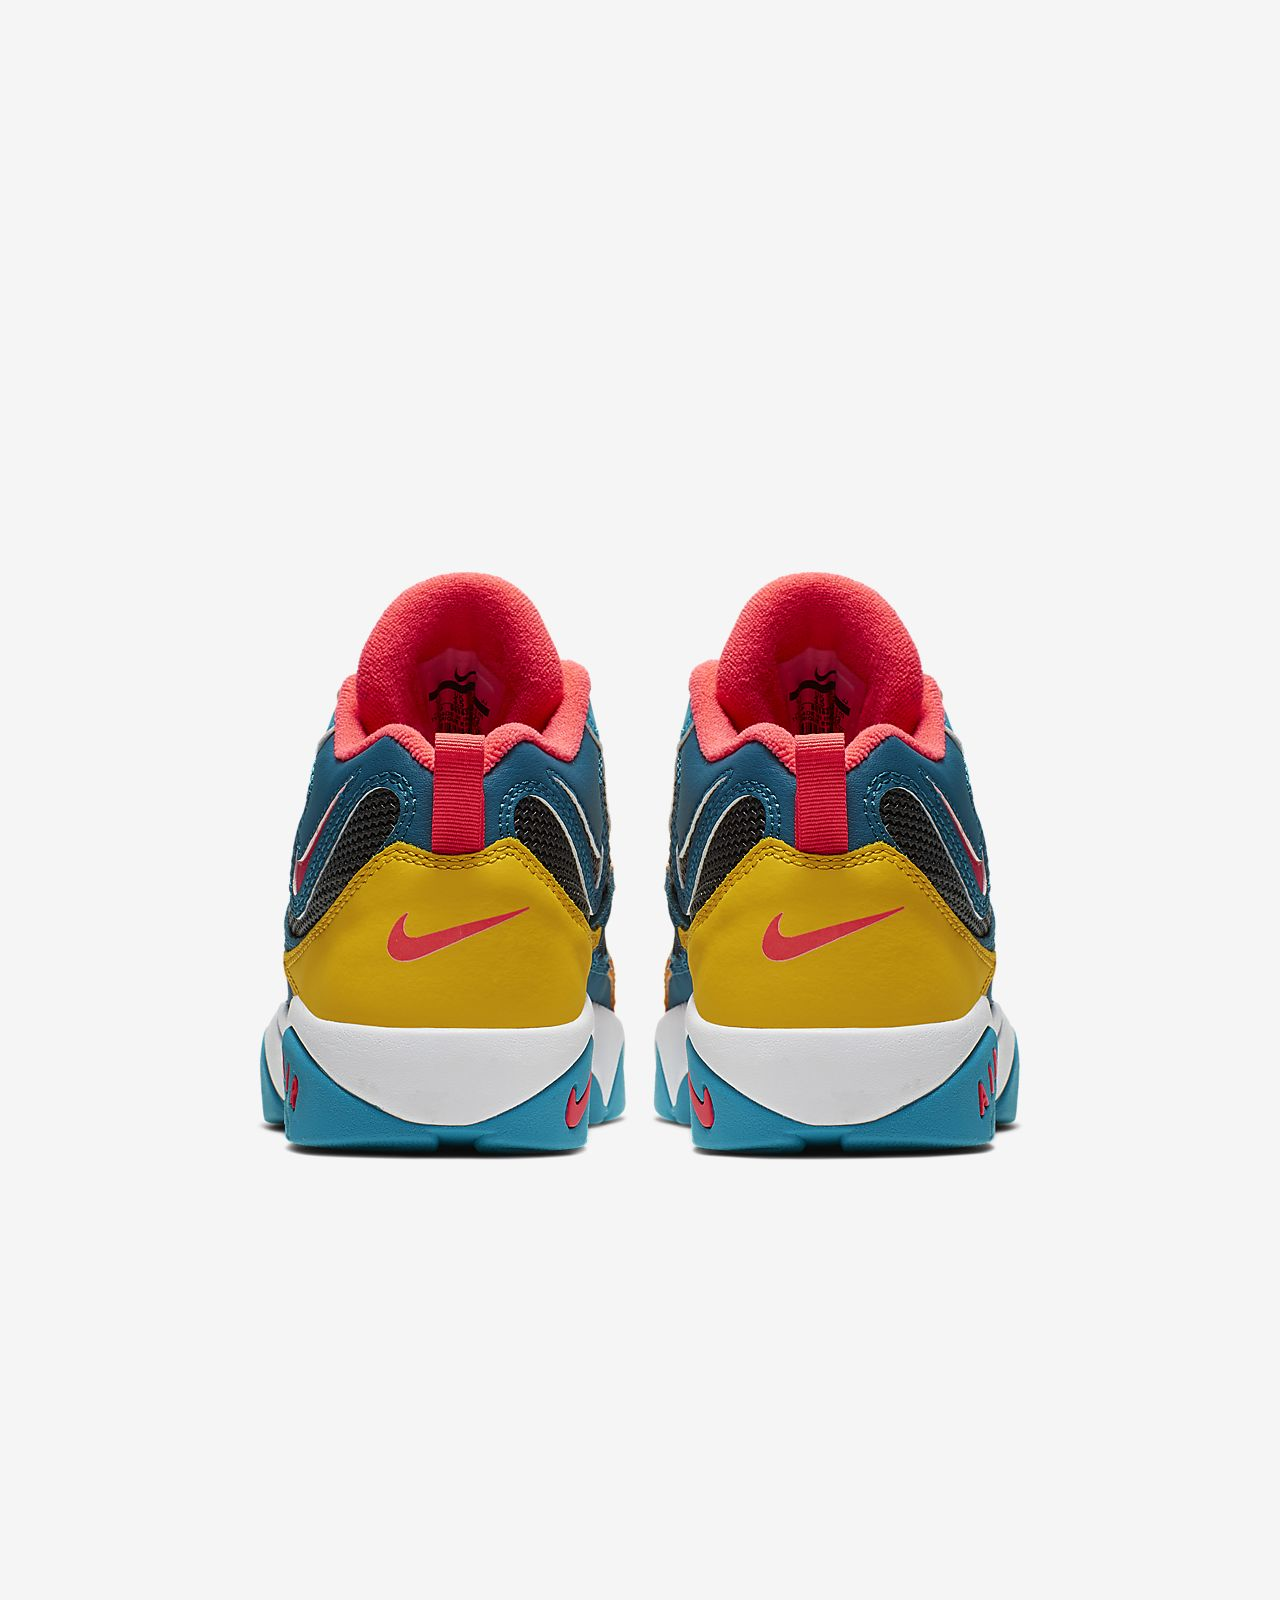 ab46d3c9c1 Nike Air Max Speed Turf Big Kids' Shoe. Nike.com